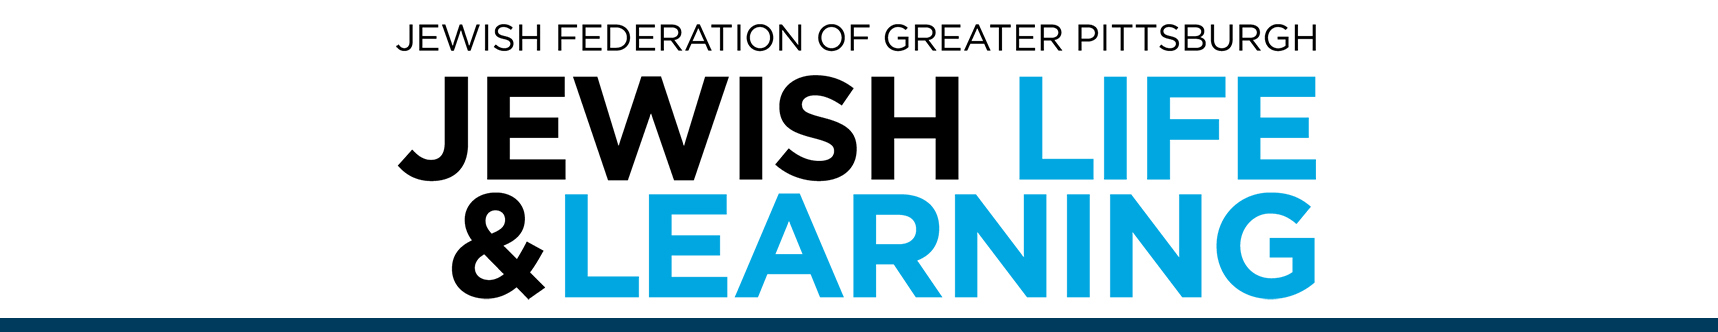 Jewish Life & Learning